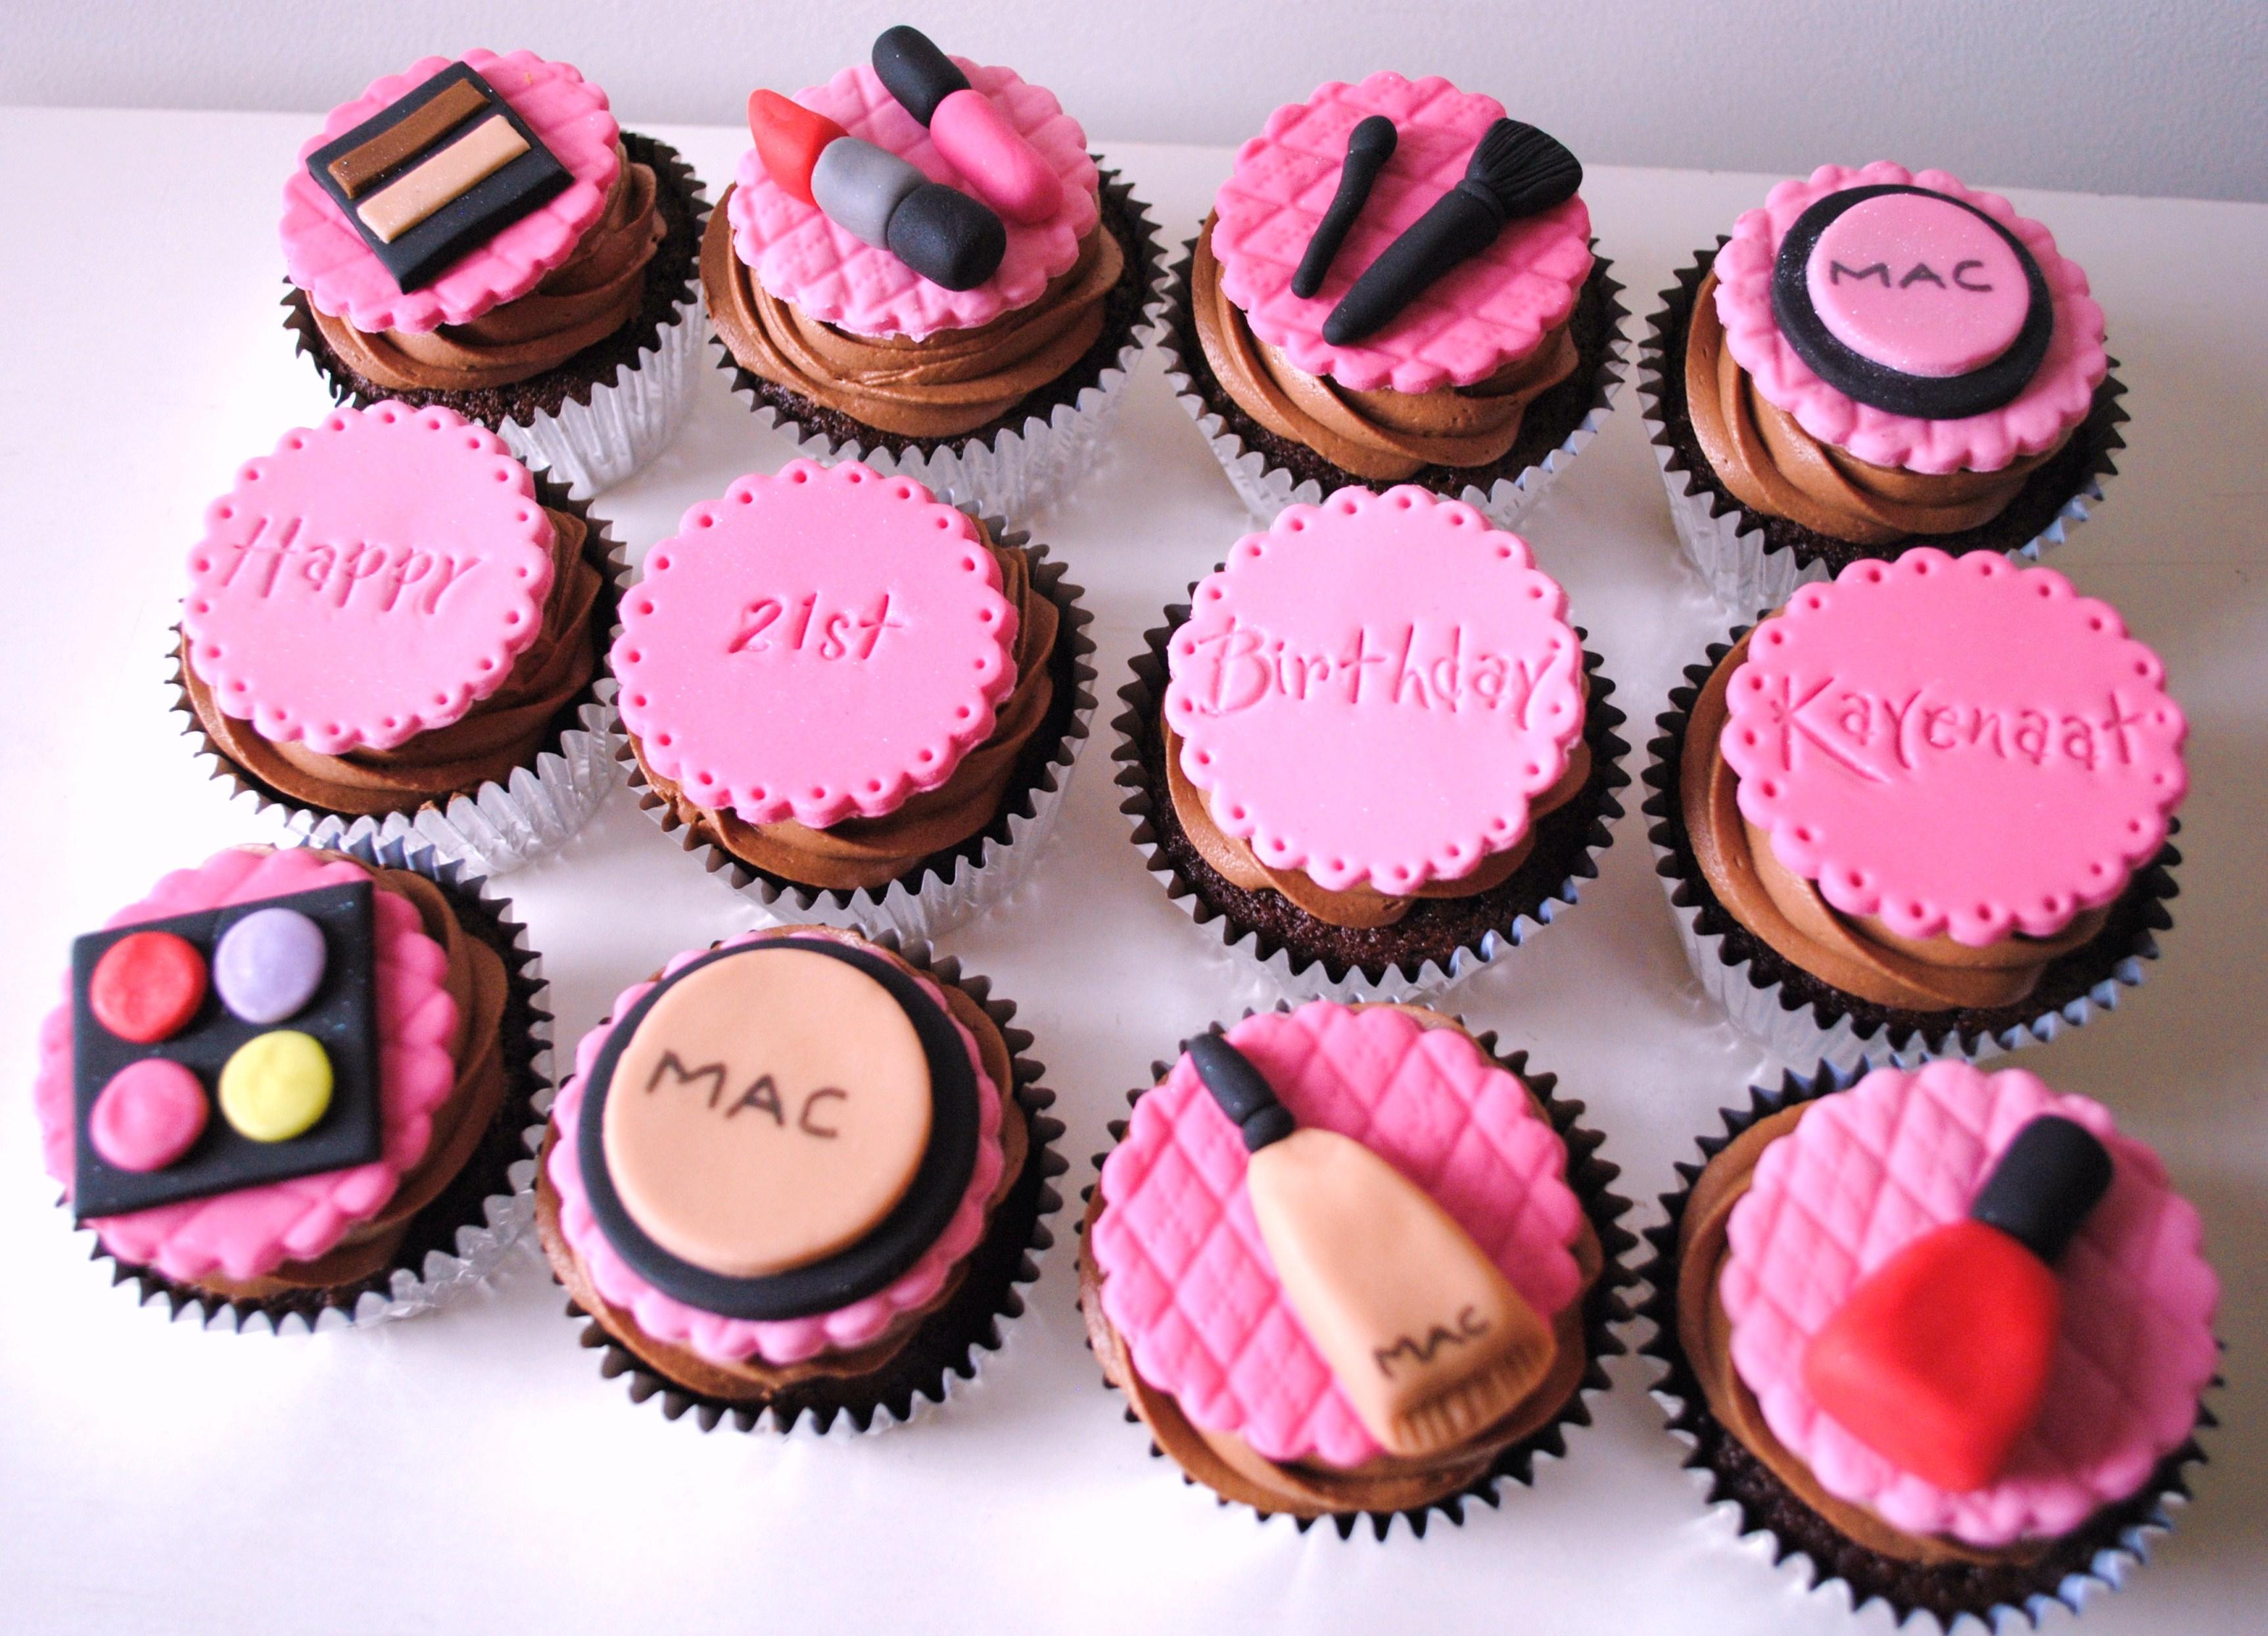 Miss Cupcakes» Blog Archive » MAC make up themed birthday boxset(12)